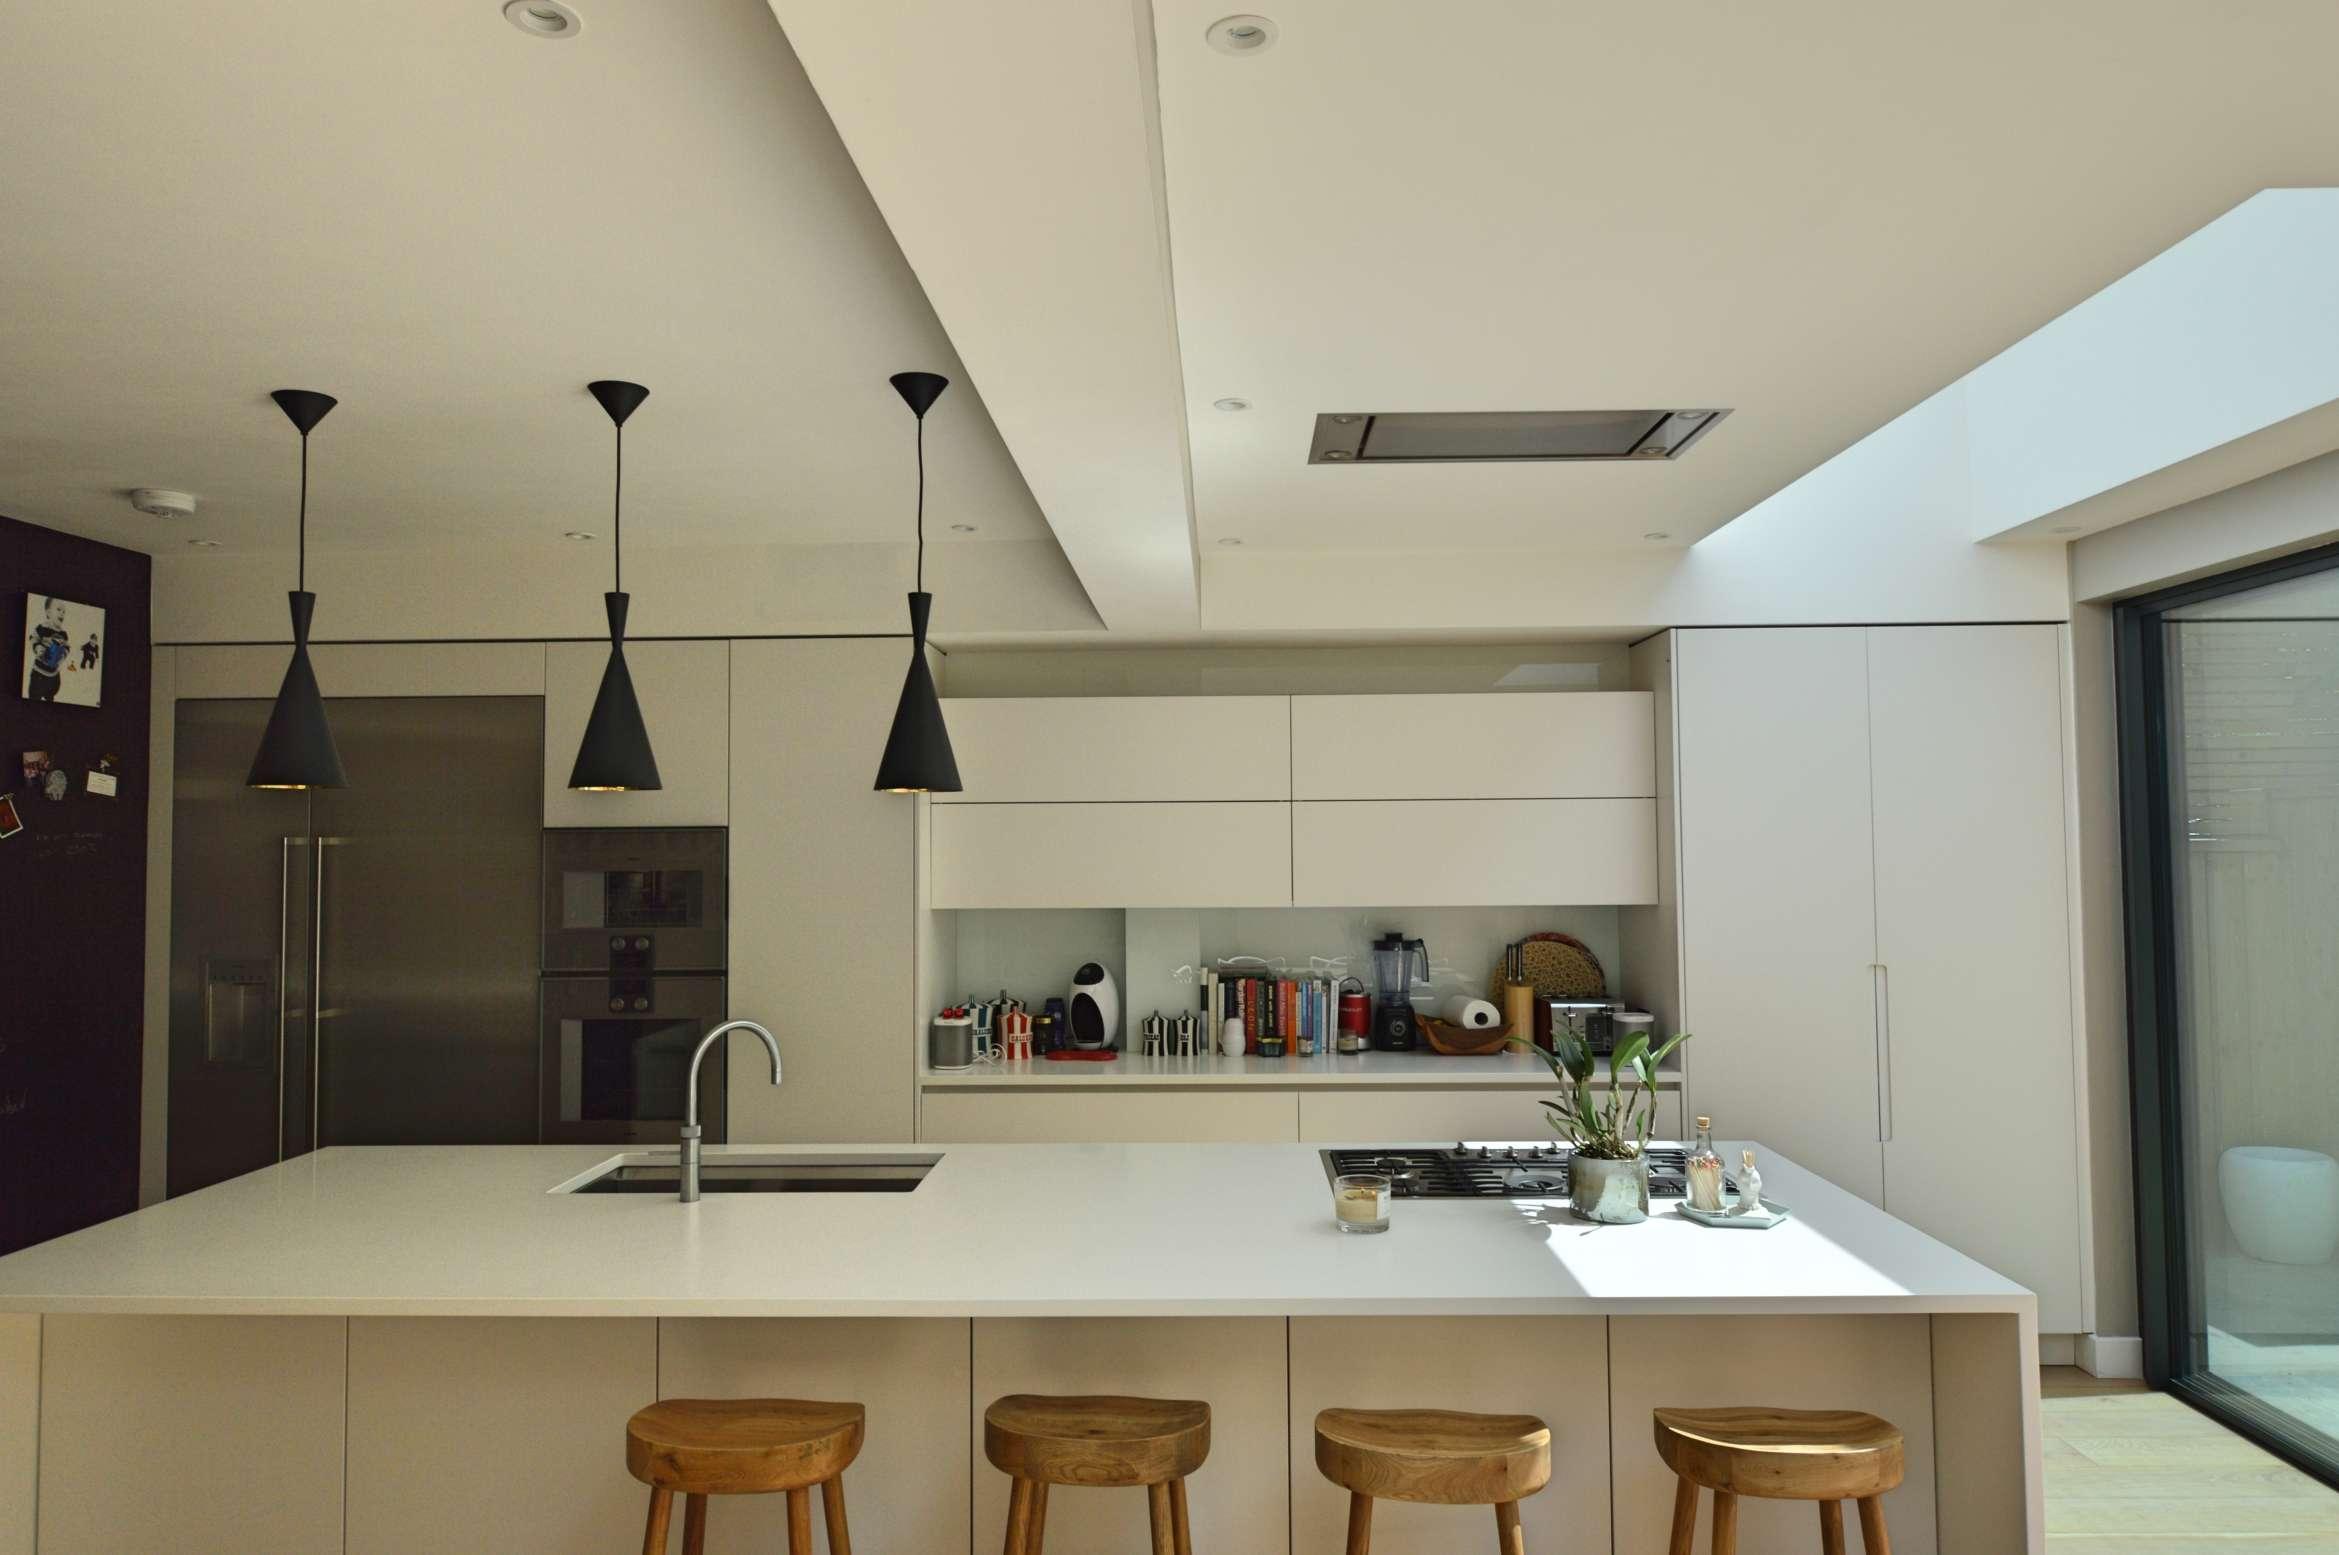 Architect designed rear house extension Highgate Haringey N6 – Kitchen breakfast area Highgate, Haringey N6 | Rear house extension